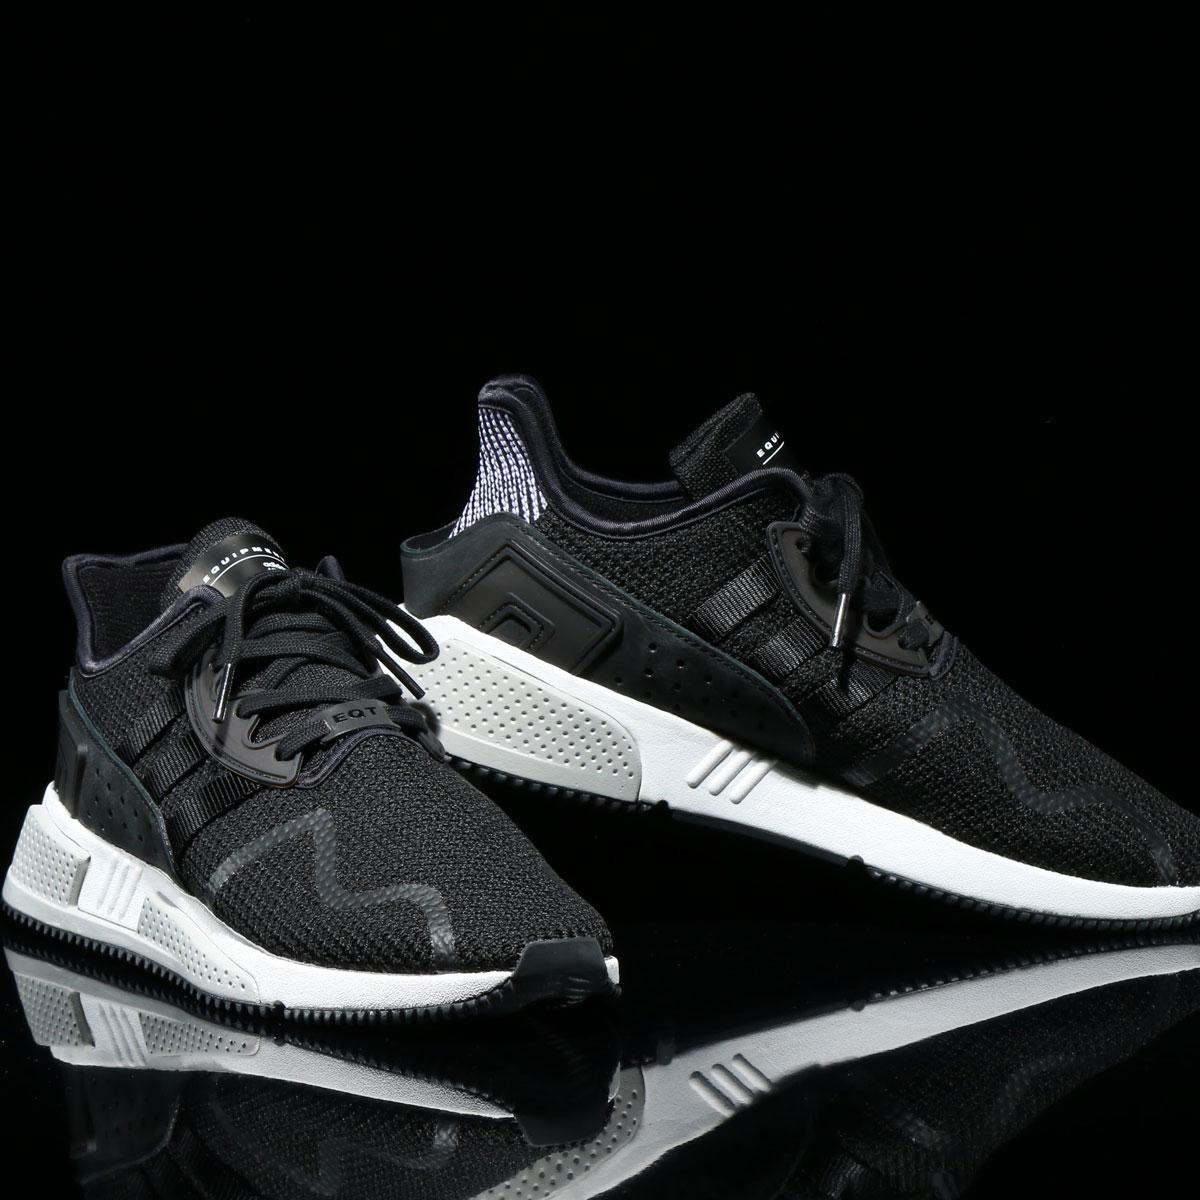 adidas Originals EQT CUSHION ADV (アディダス オリジナルス EQT CUSHION ADV)Core Black/Footwear White【レディーススニーカー】17FW-I